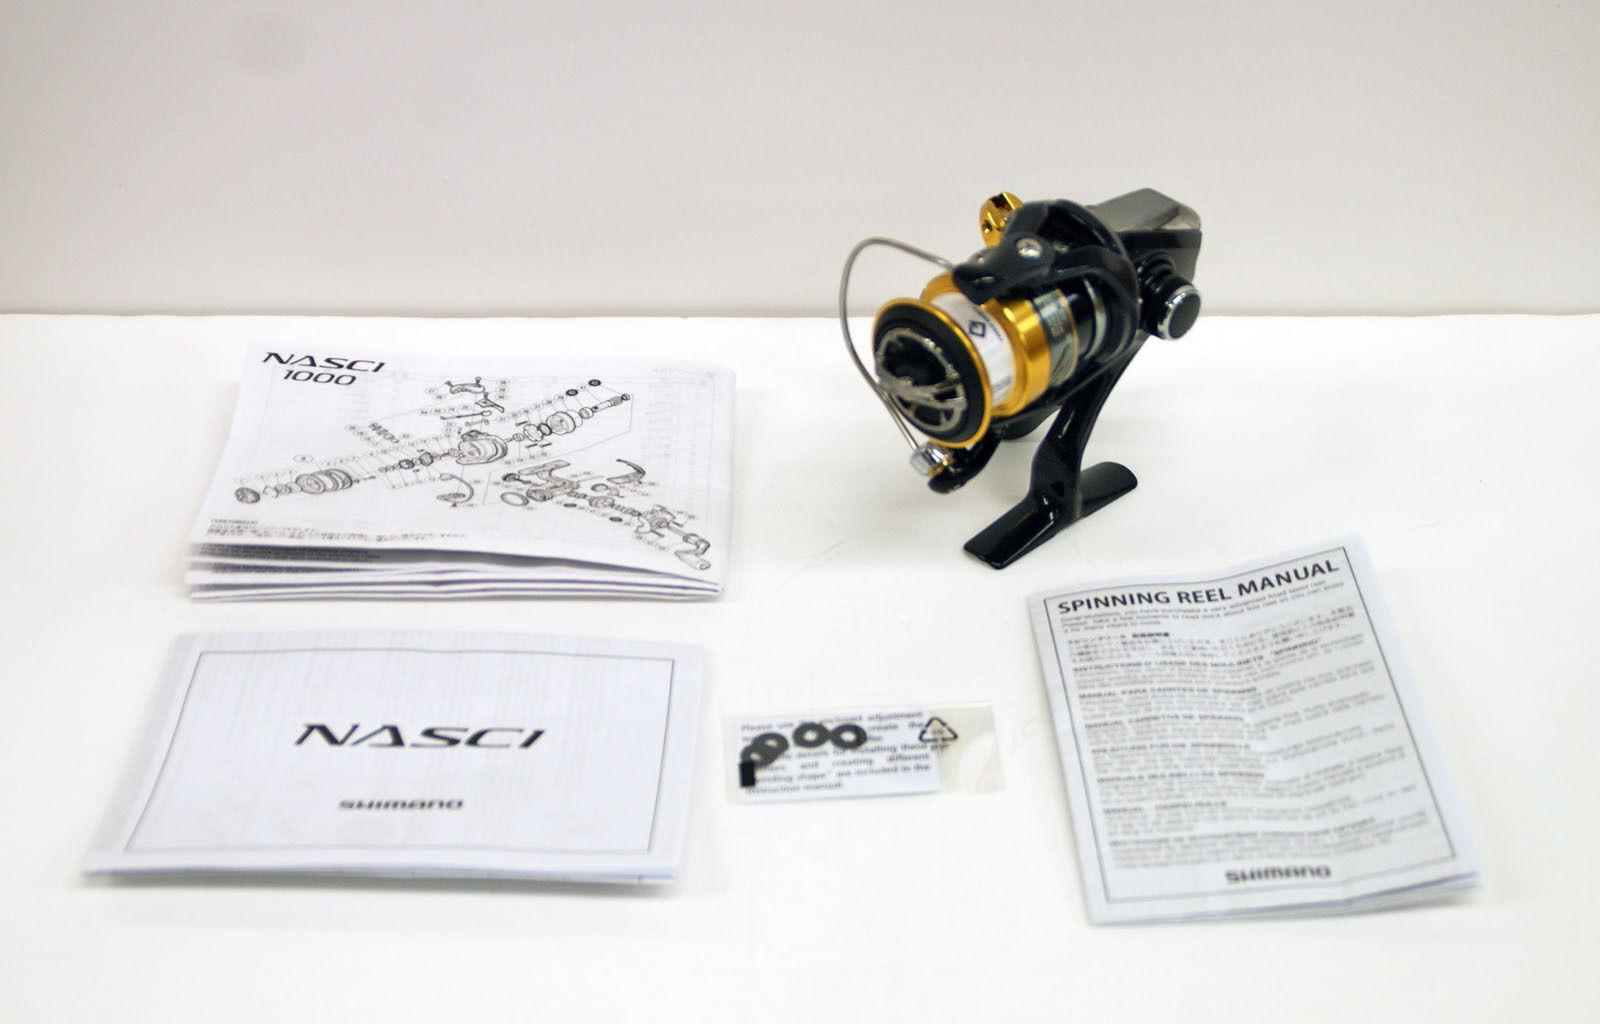 Shimano 16 16 16 Nasci 1000 Spinning Reel 4969363035677 ee0c50